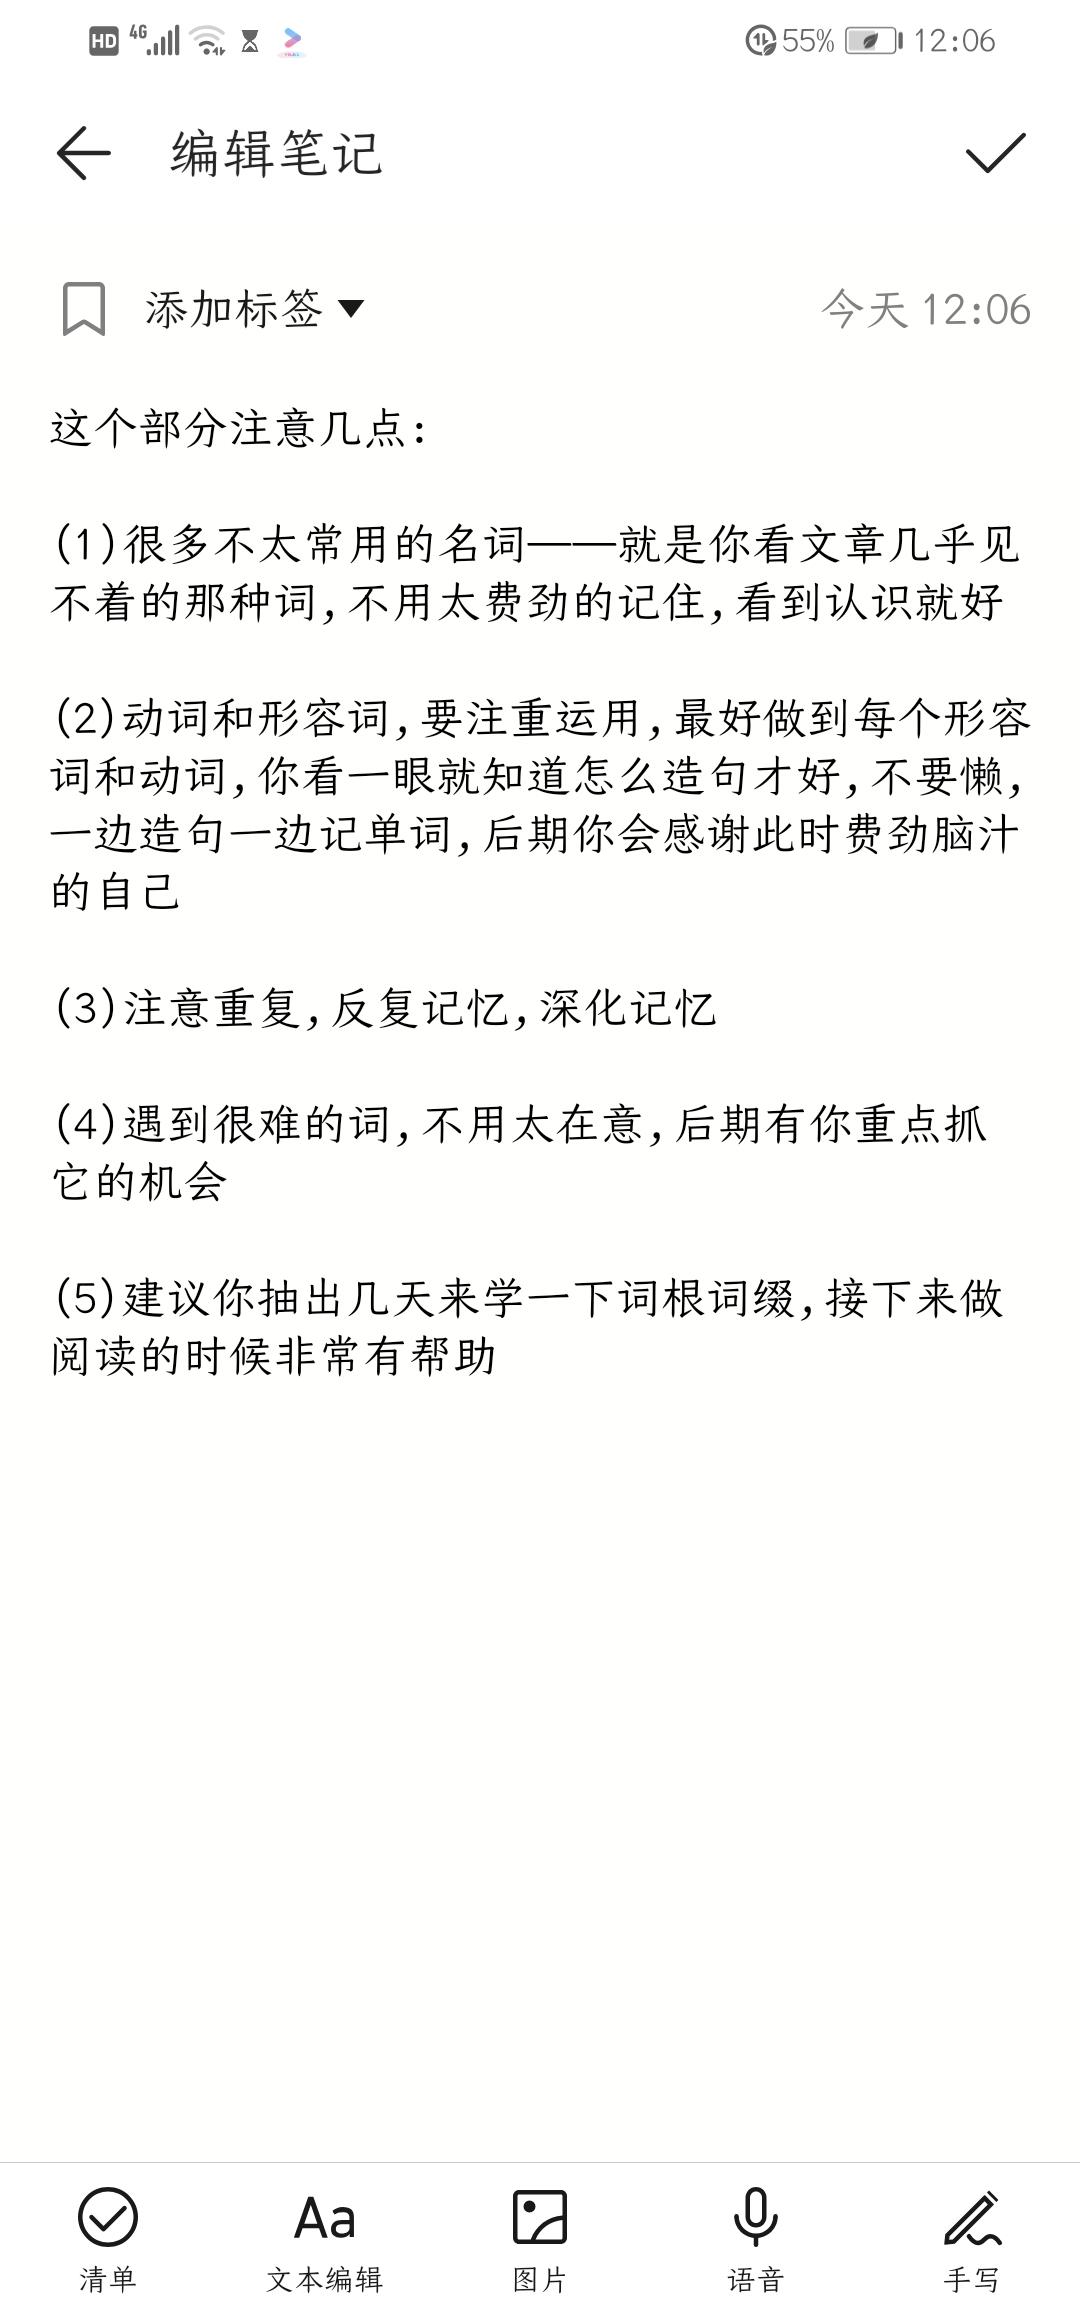 Screenshot_20190715_120625_com.example.android.notepad.jpg